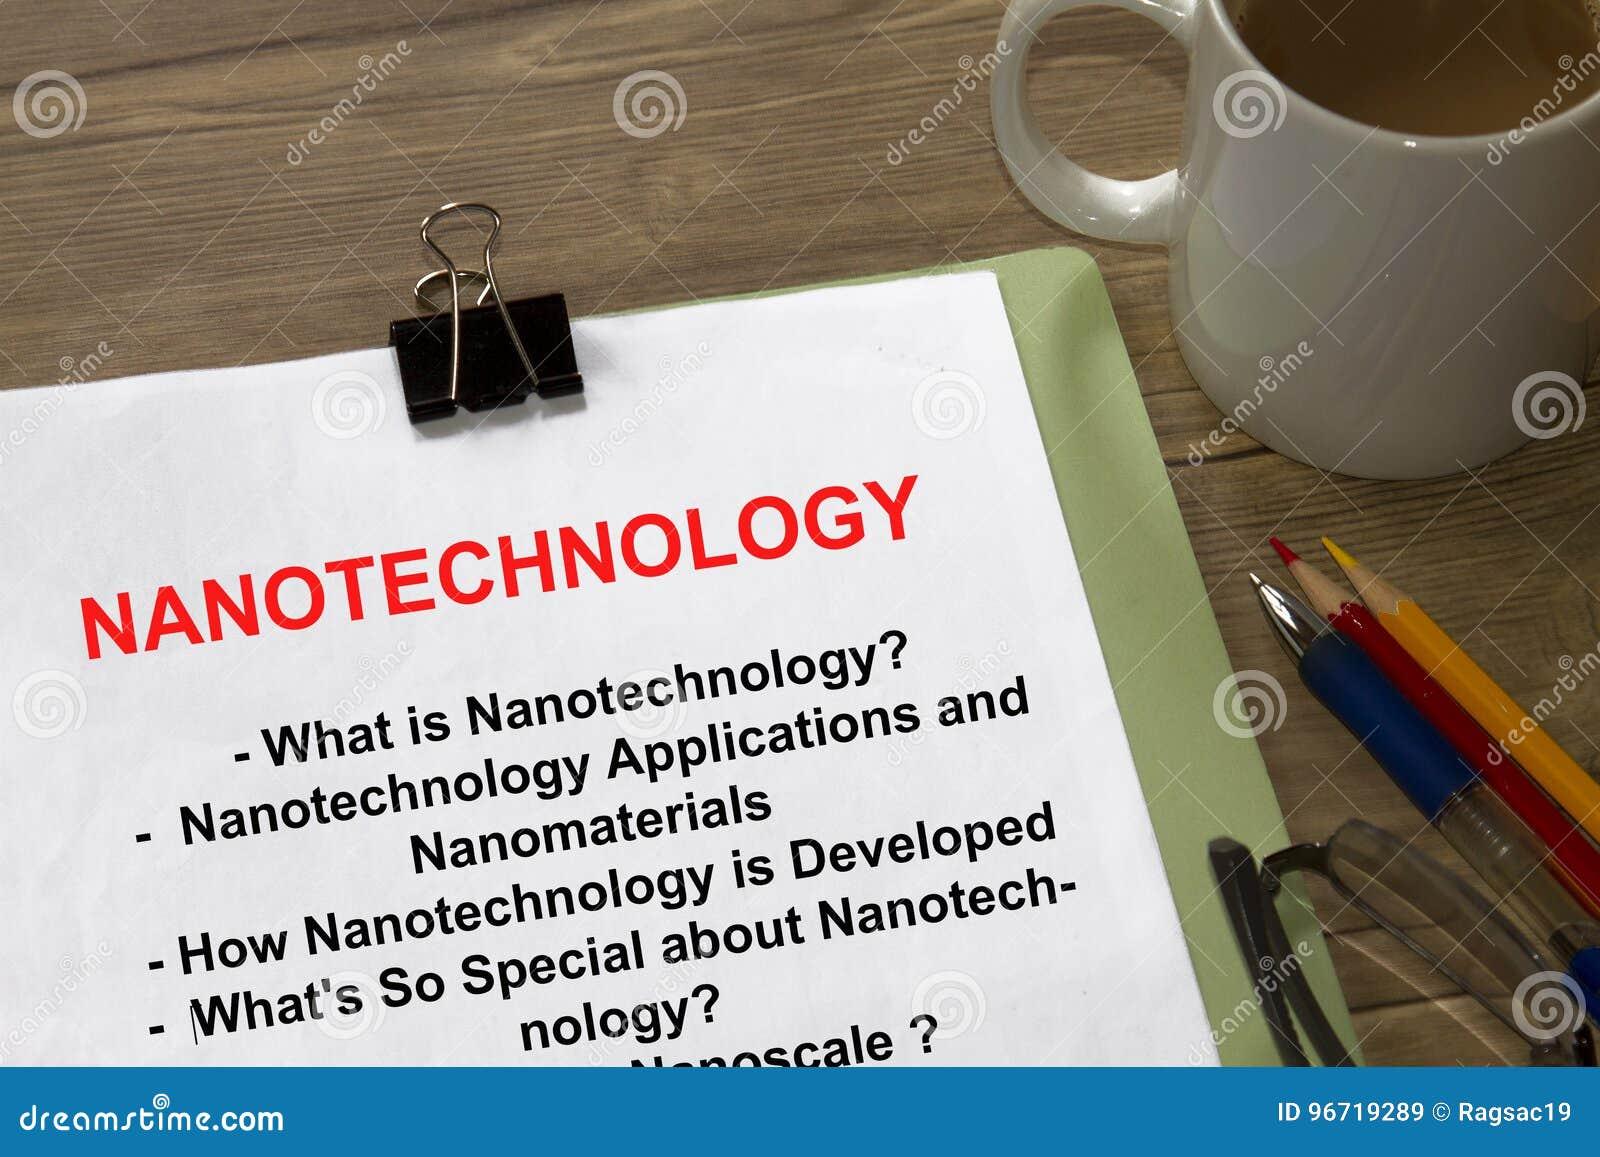 nanotechnology topics for paper presentation